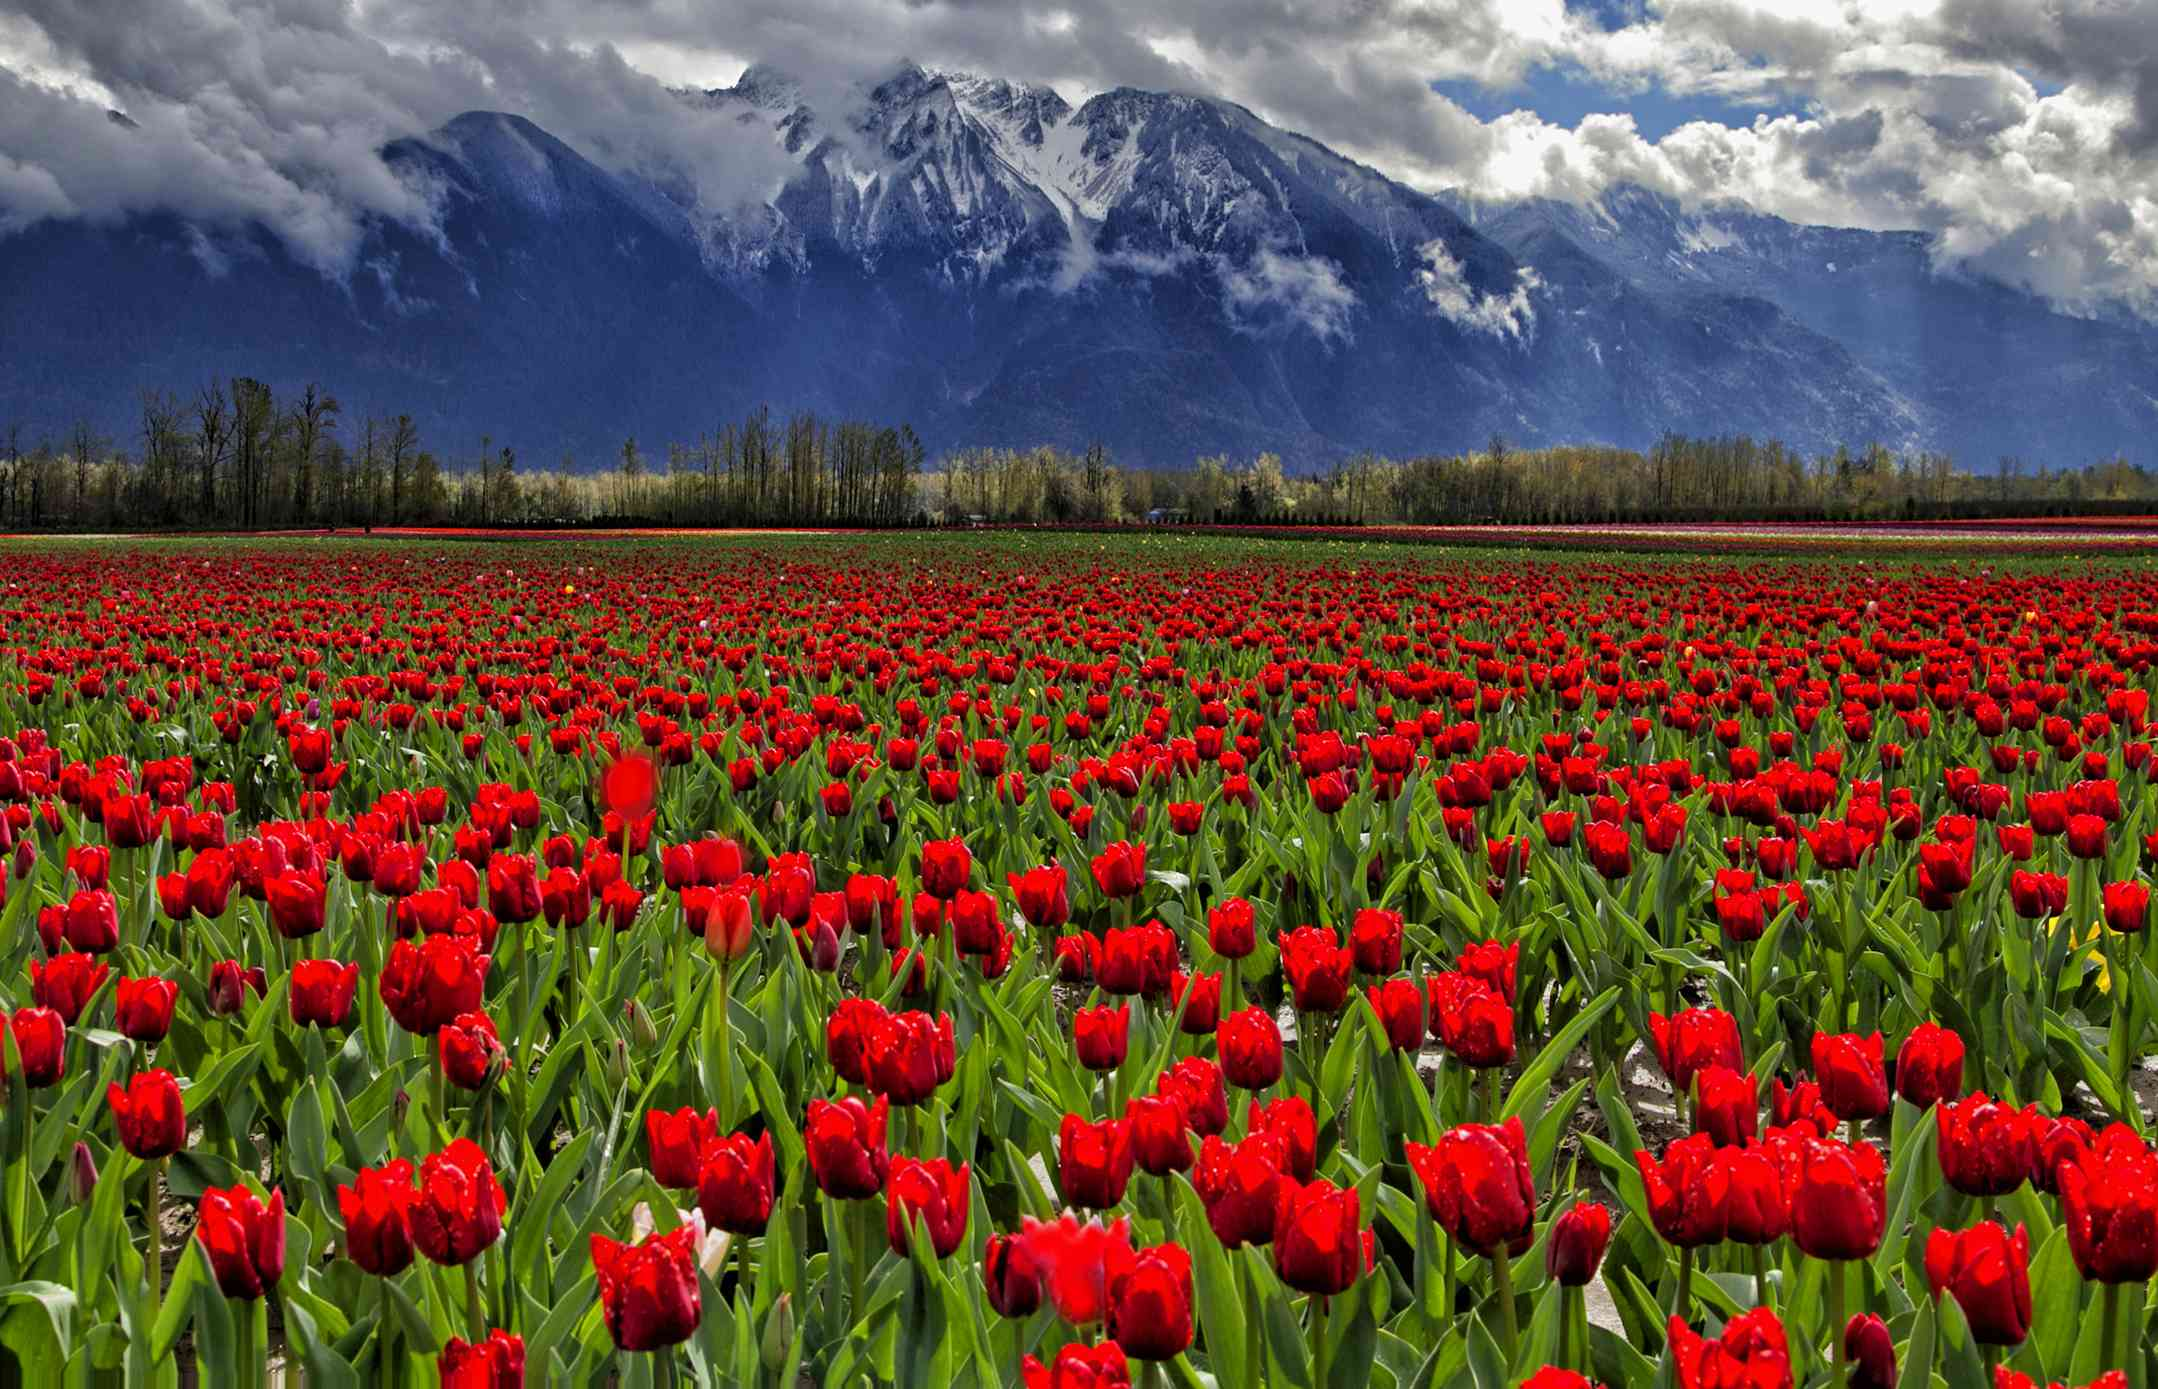 Colorful tulip fields in British Columbia